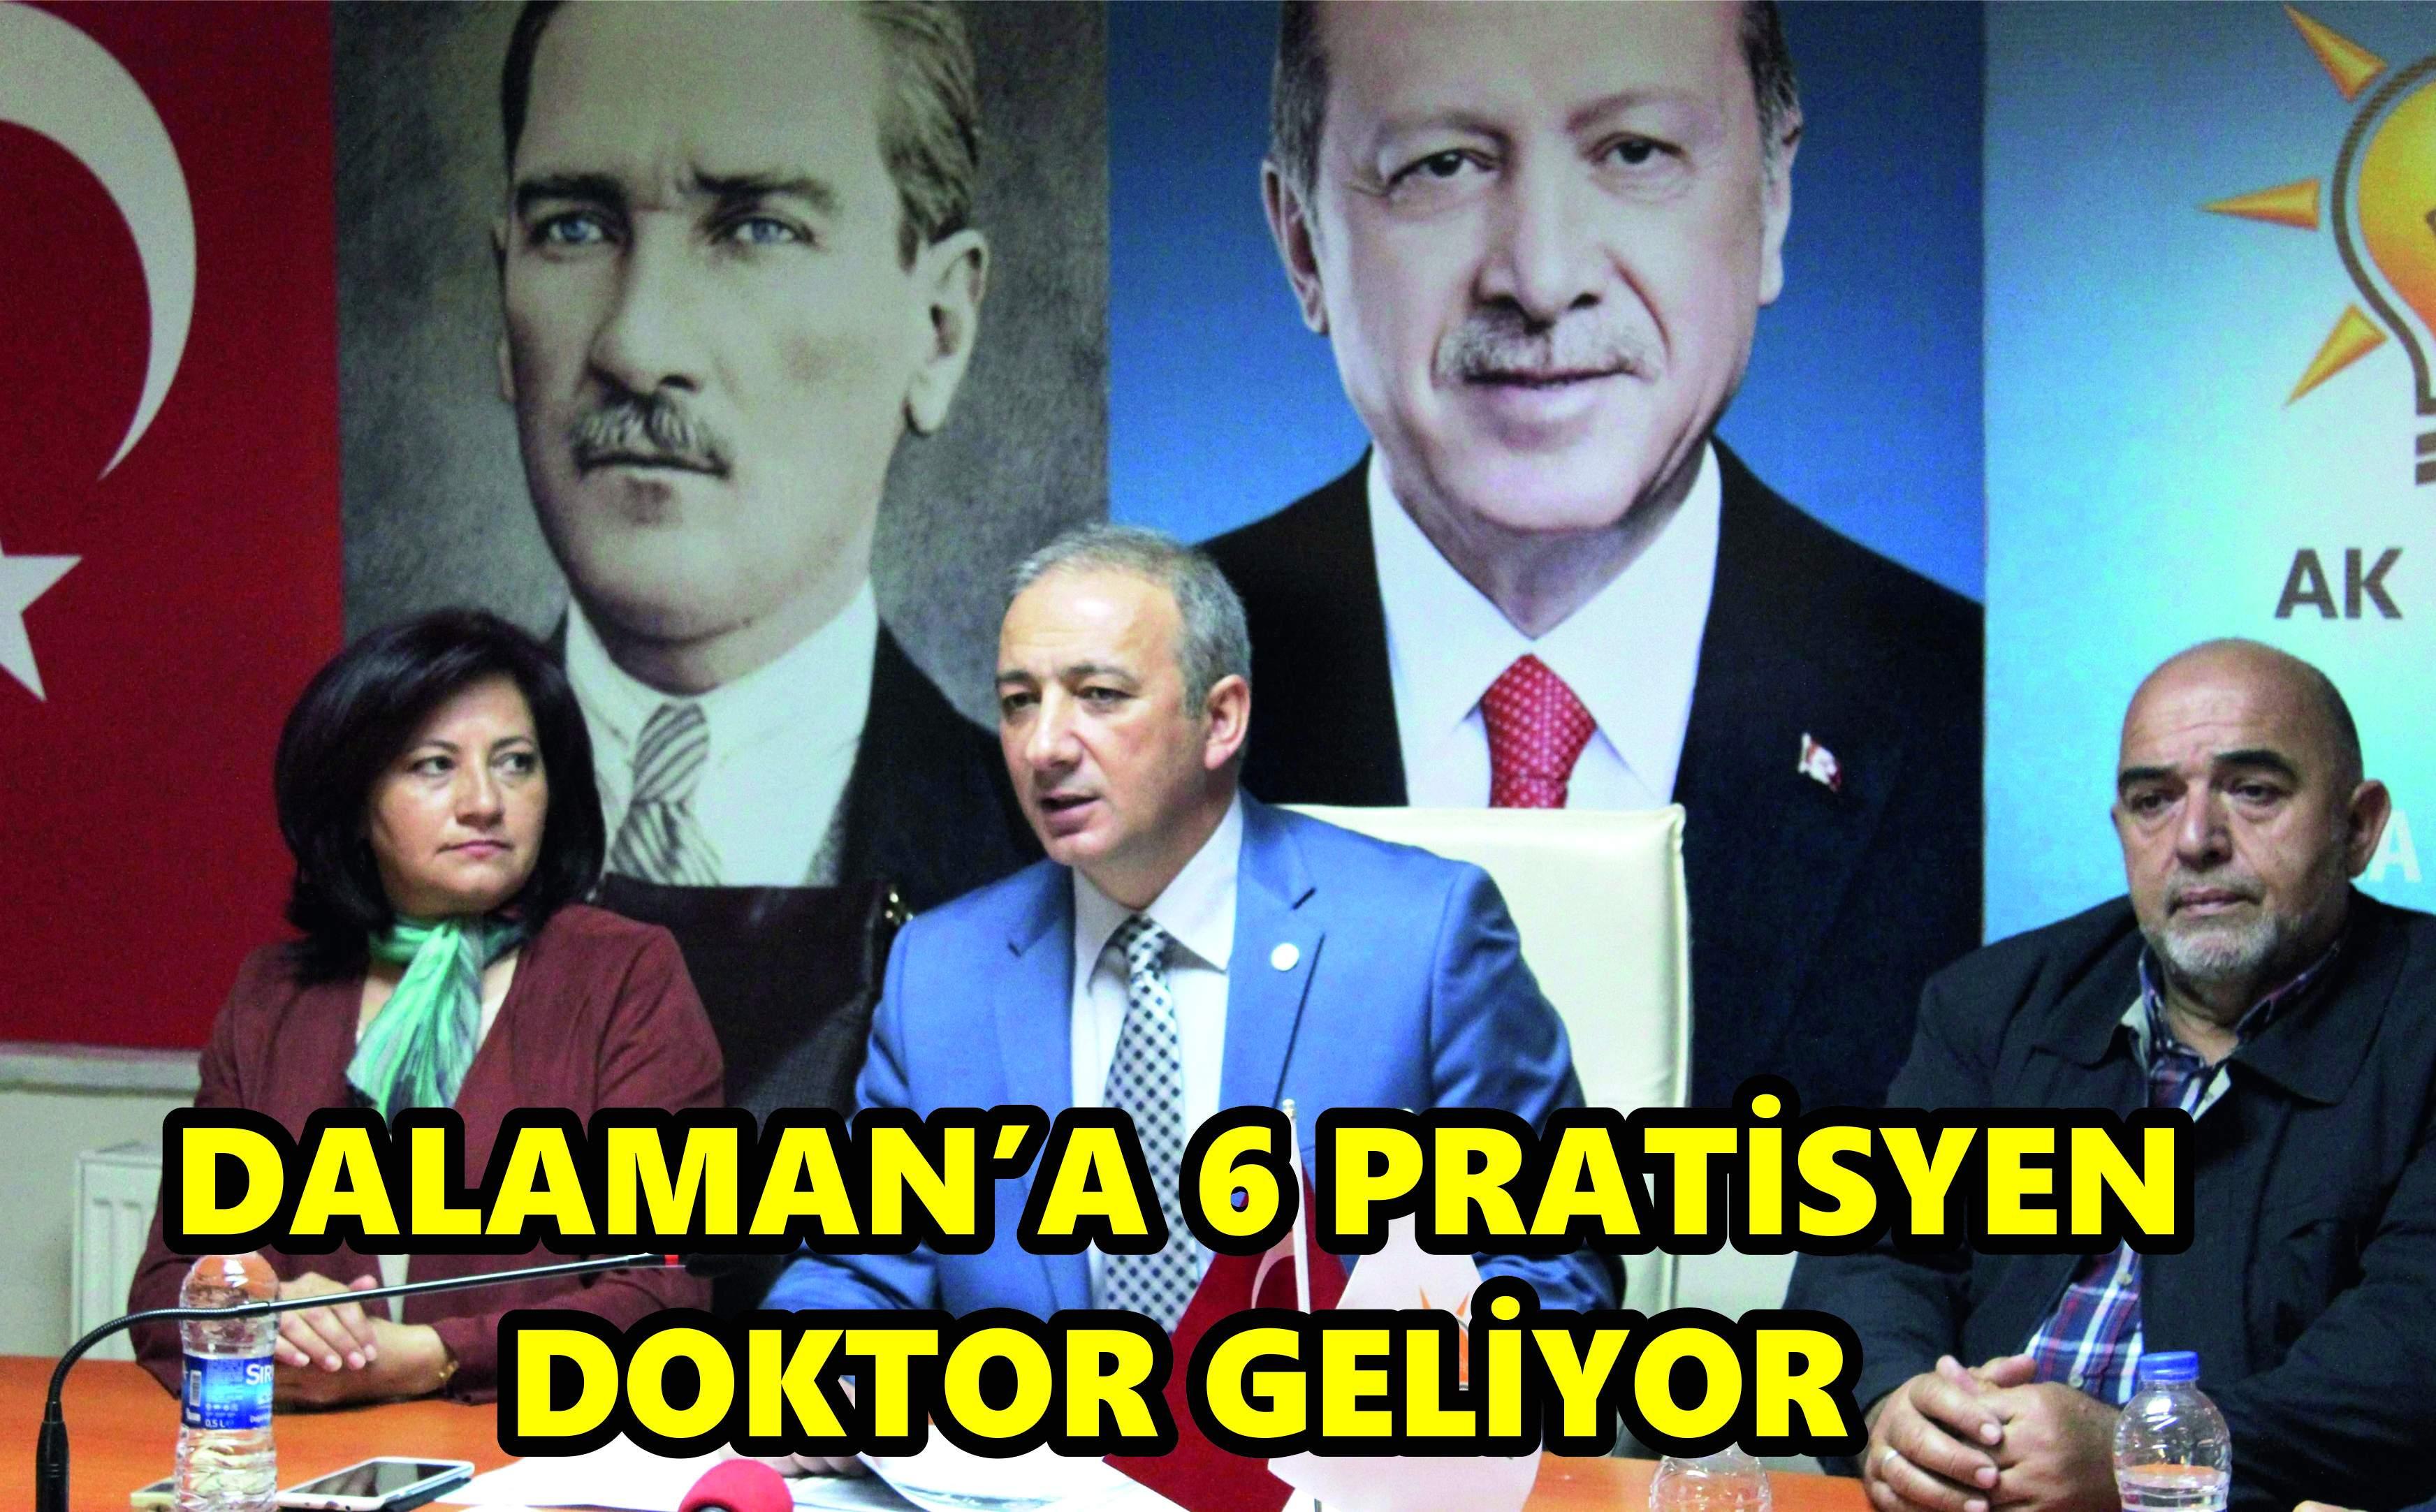 DALAMAN'A 6 PRATİSYEN DOKTOR